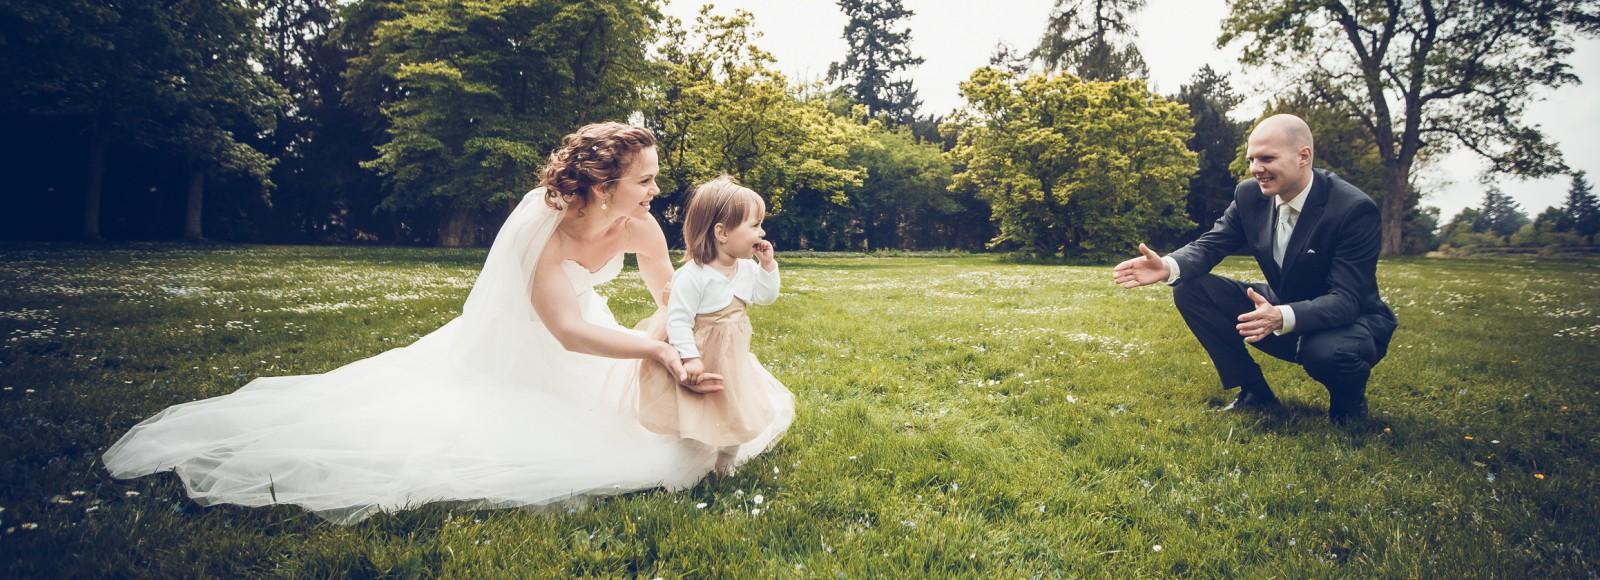 Hochzeitsfotografie-Luptscho.de-04